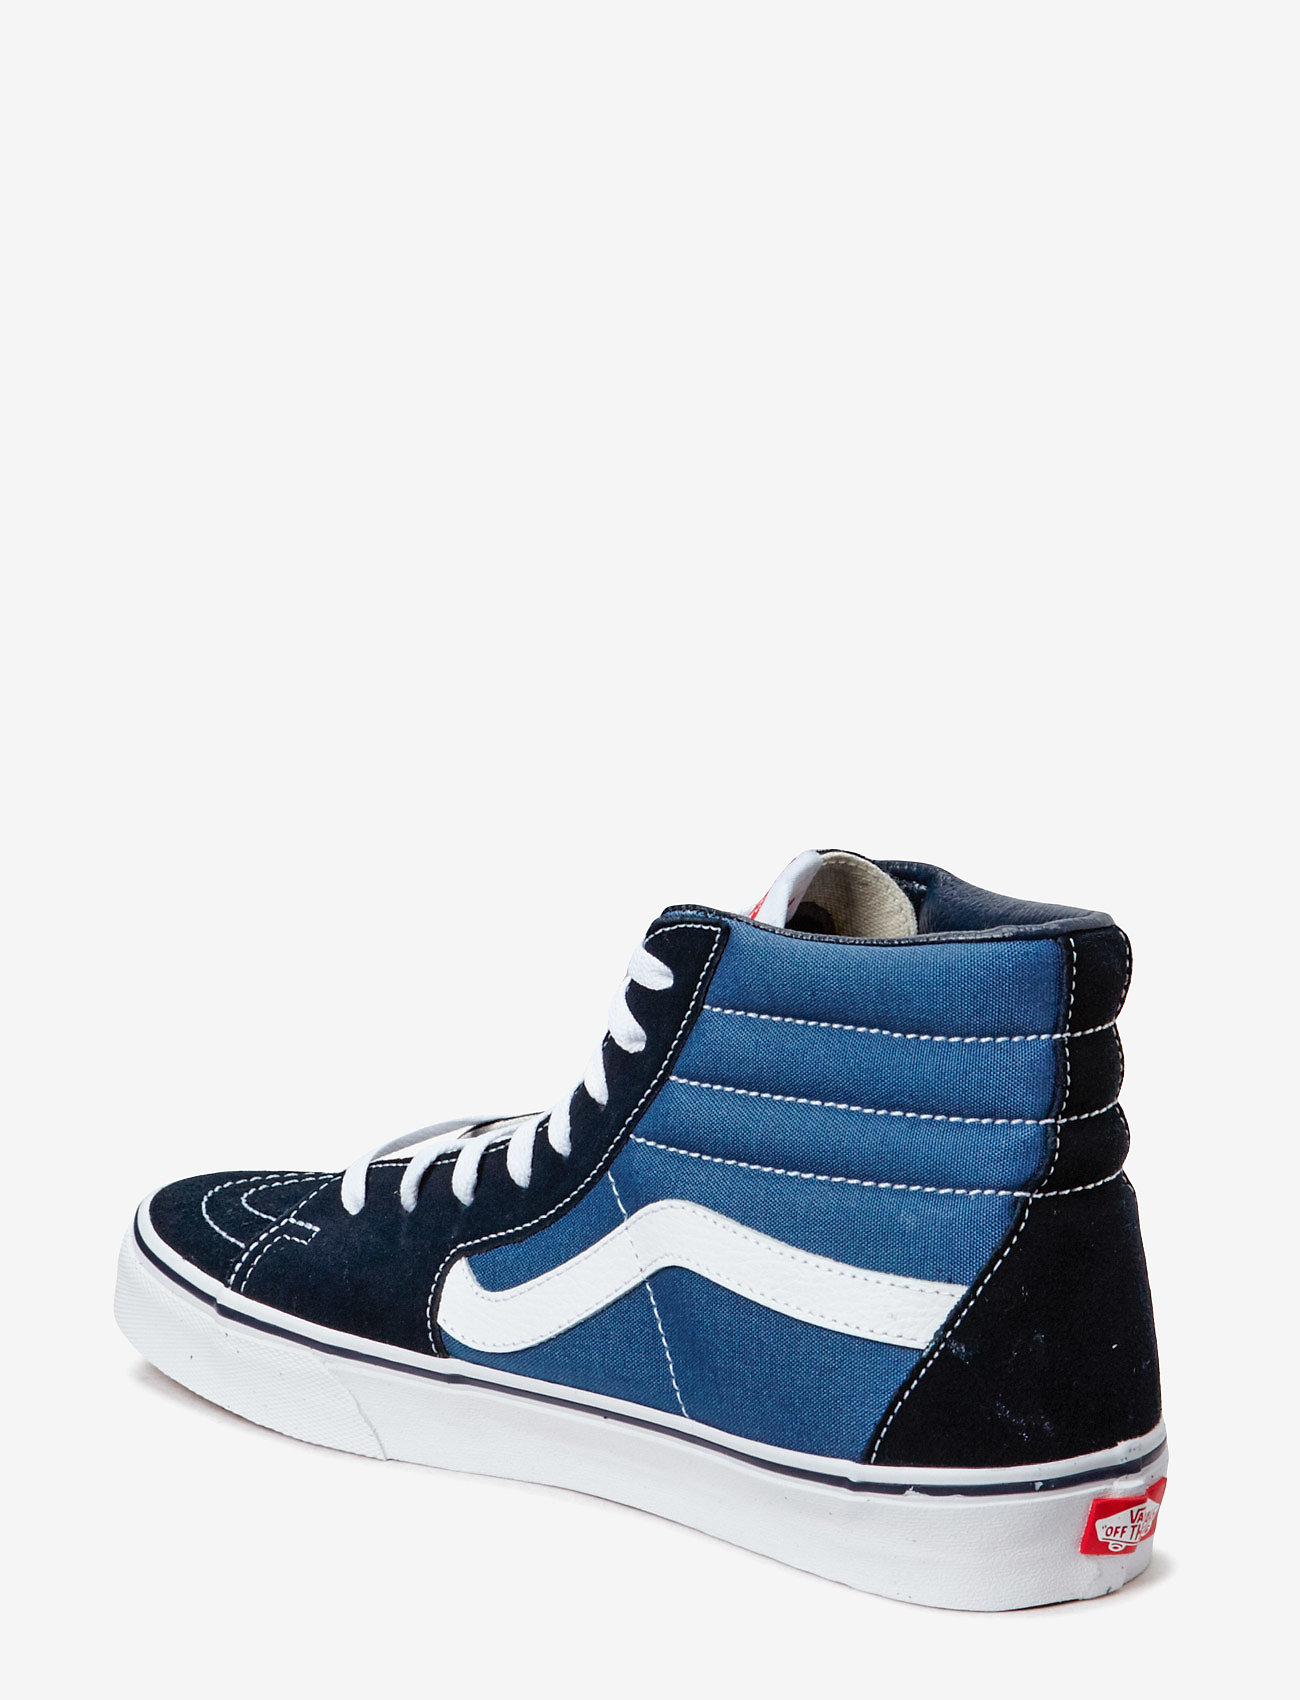 VANS - UA SK8-Hi - hoog sneakers - navy - 1